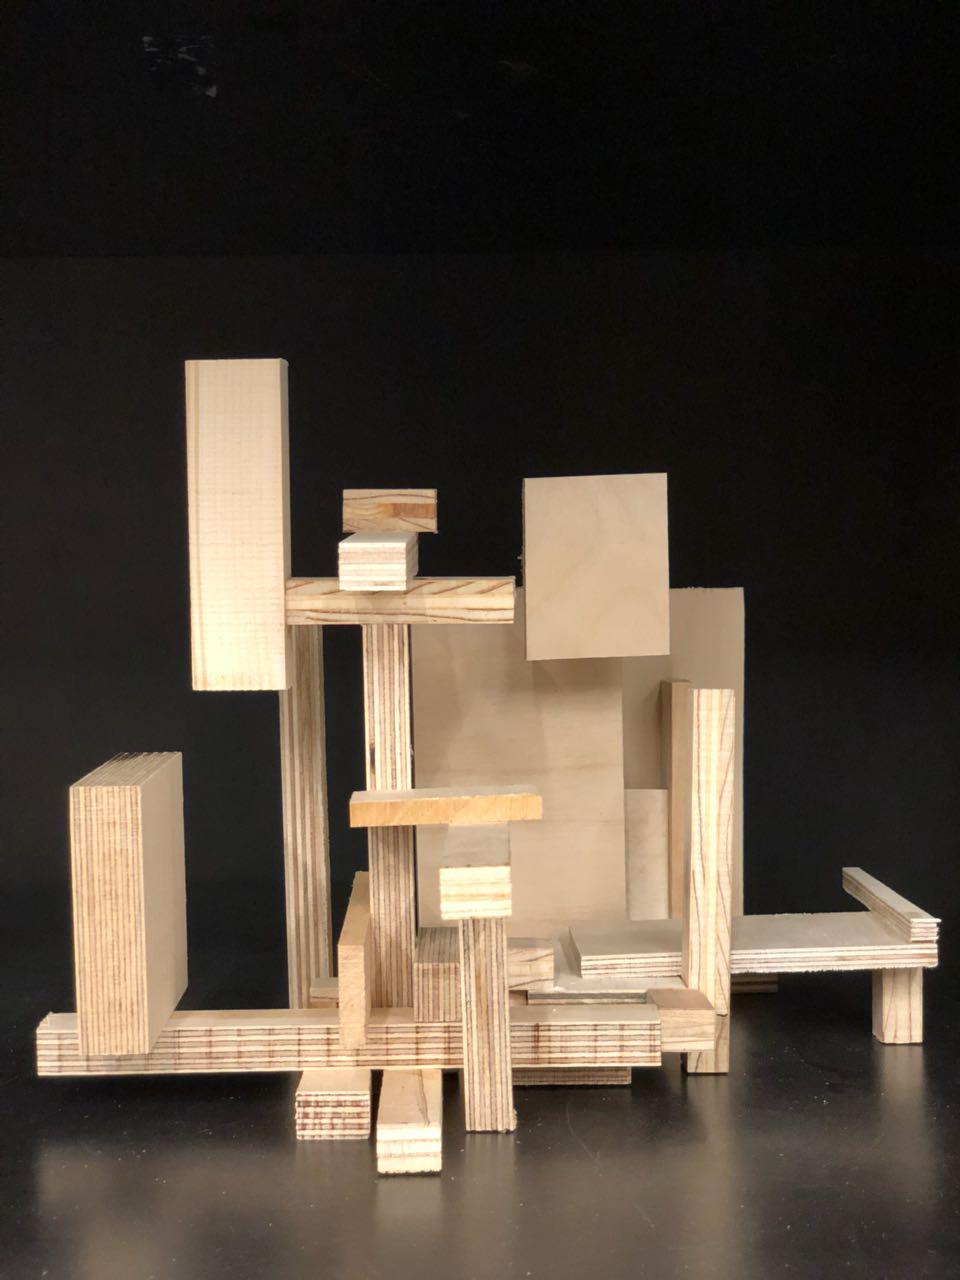 Project 1 Studio